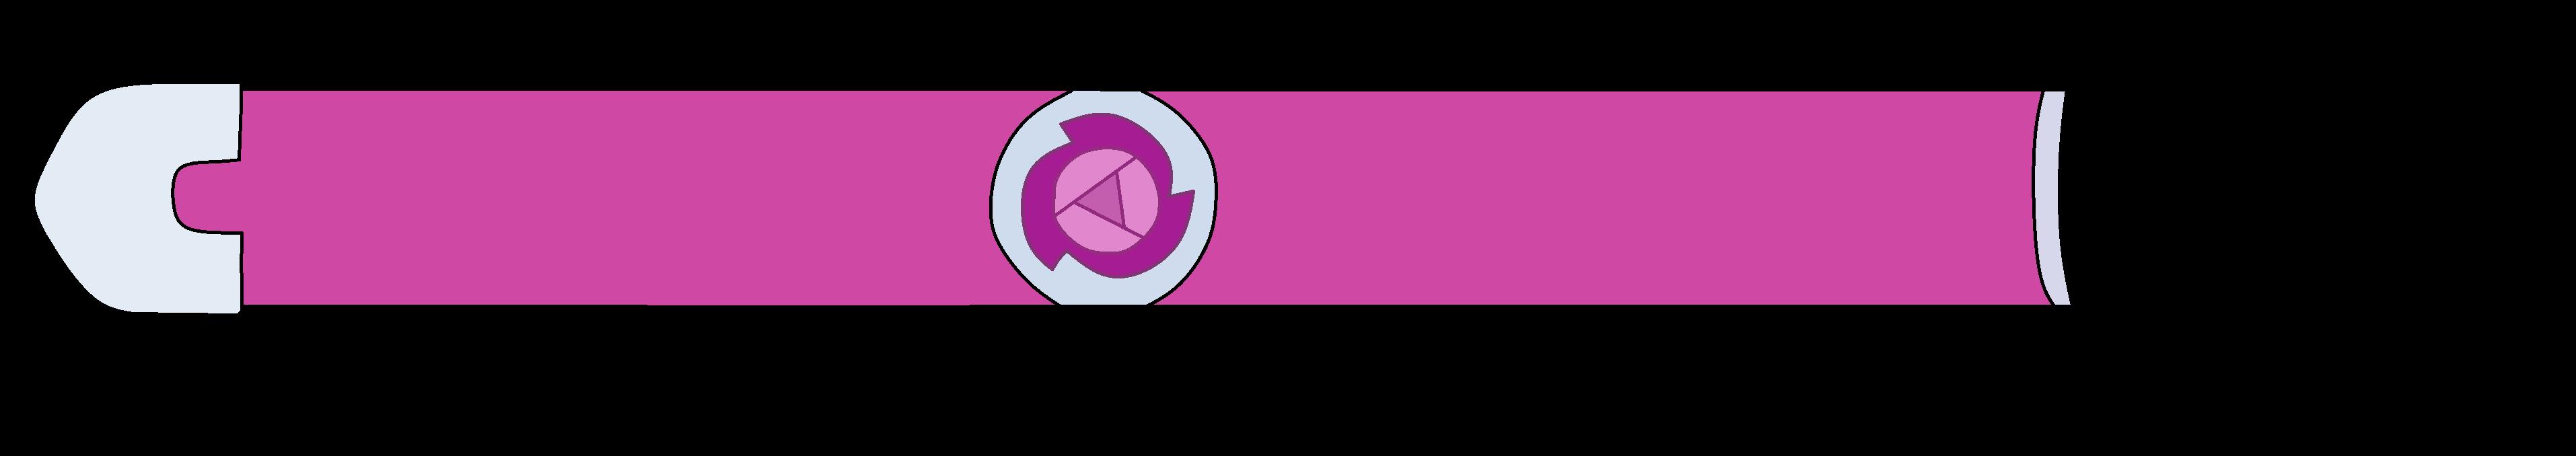 Rose Quartz Steven Universe Sword Design: Image Result For Steven Universe Sword Sheath